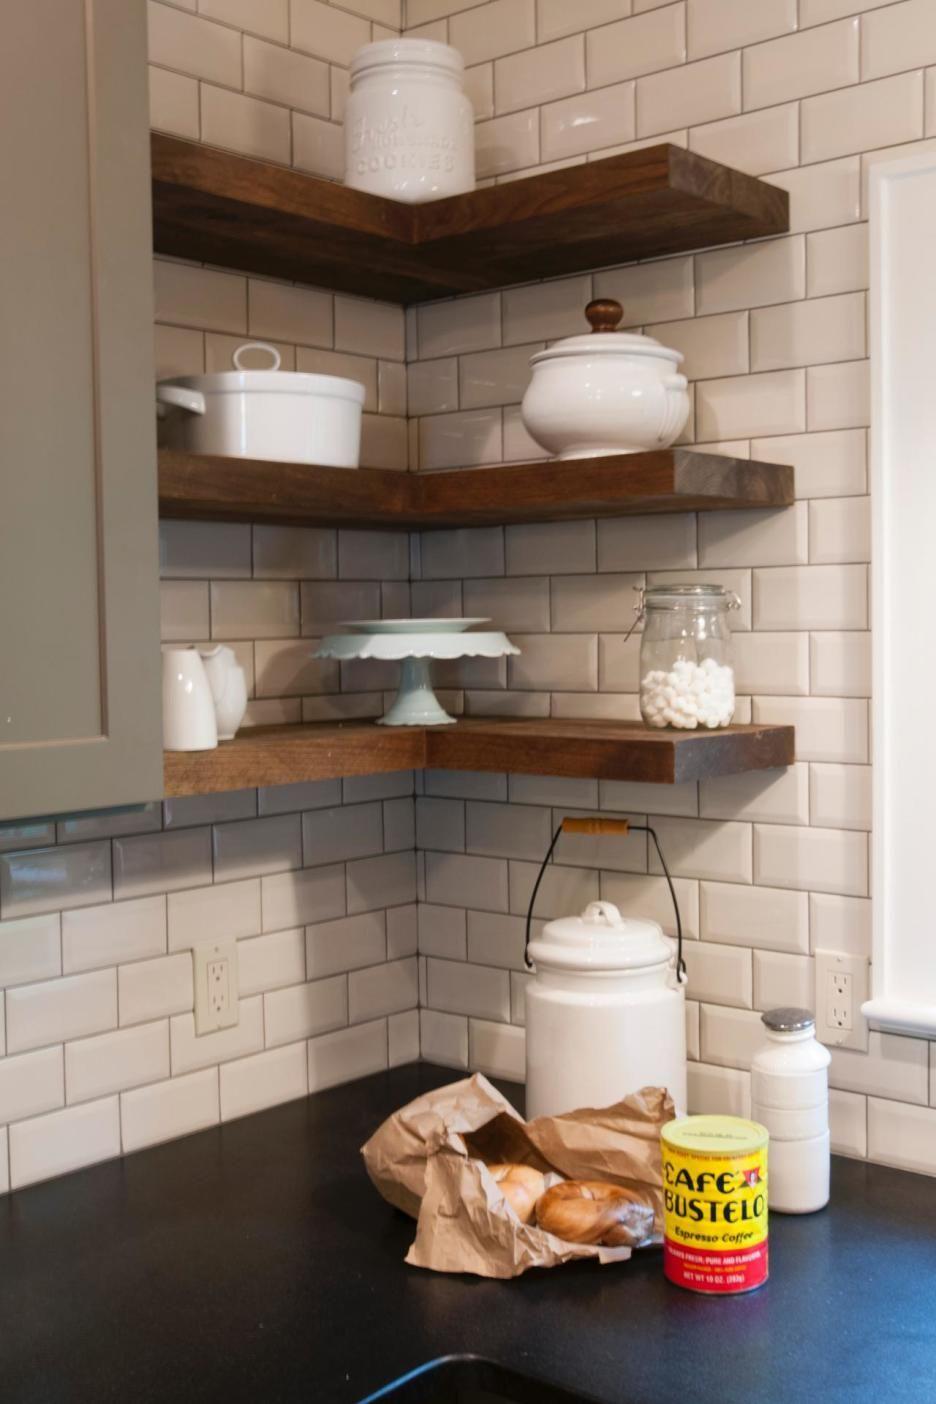 furniture walnut reclaimed pine wood floating kitchen shelves above black countertop white corner brick tile backsplash cool ideas closet shelf dividers wall mount dvd storage